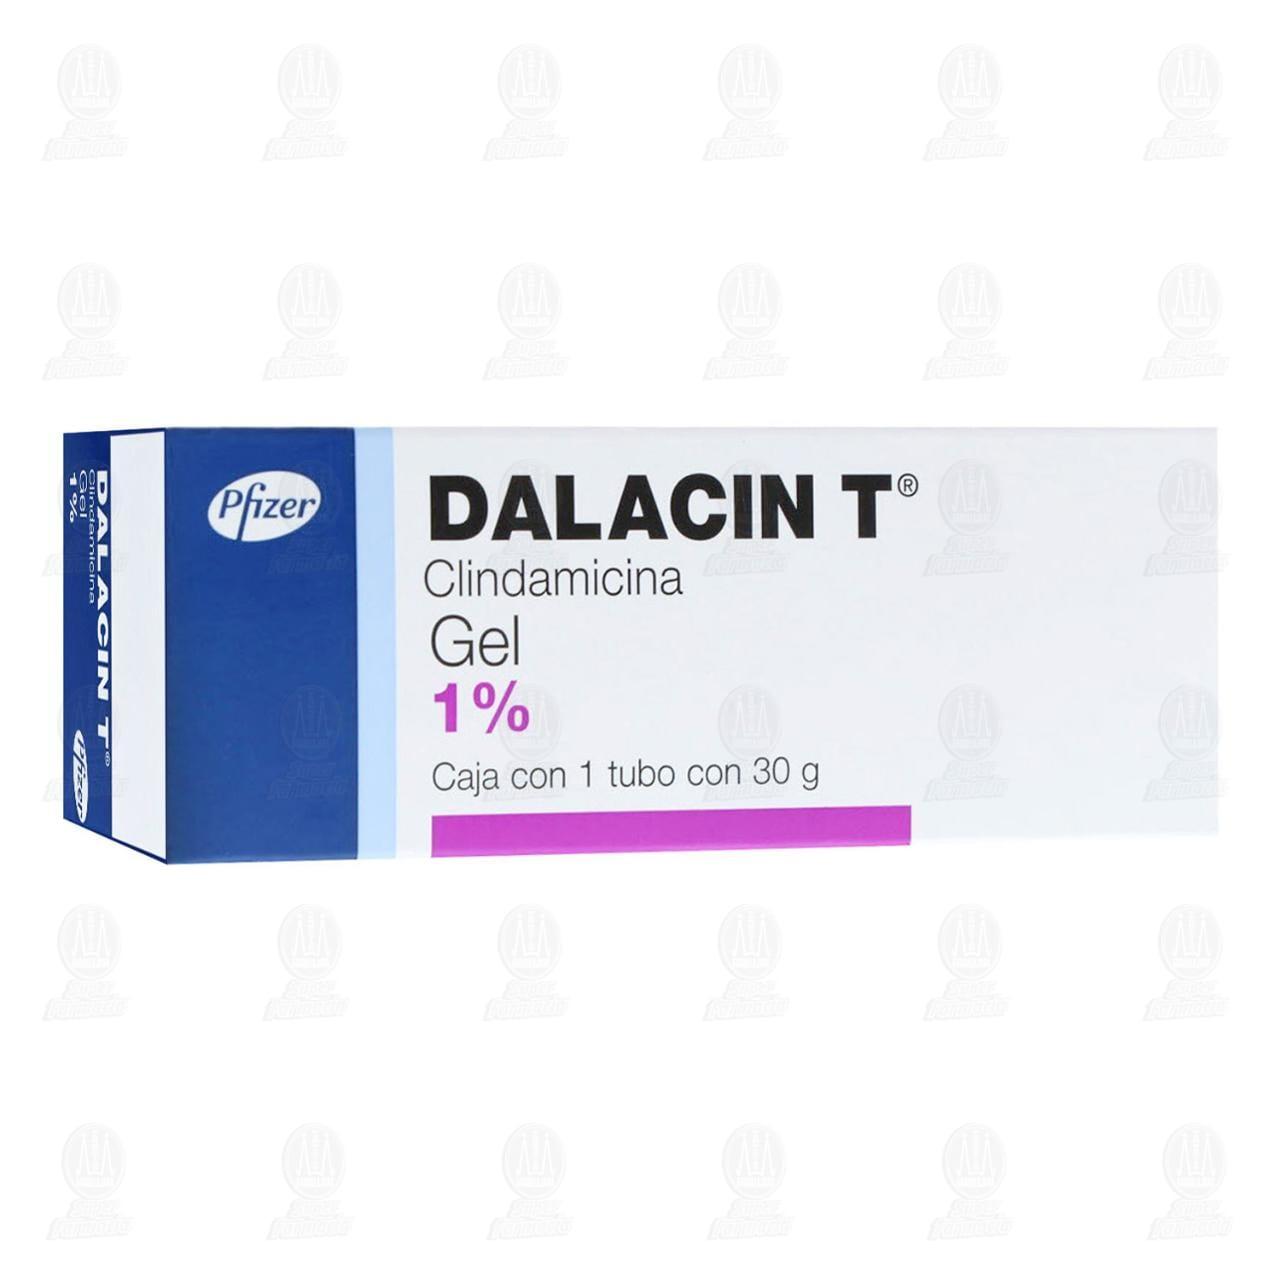 Comprar Dalacin T 1% Gel 30gr en Farmacias Guadalajara